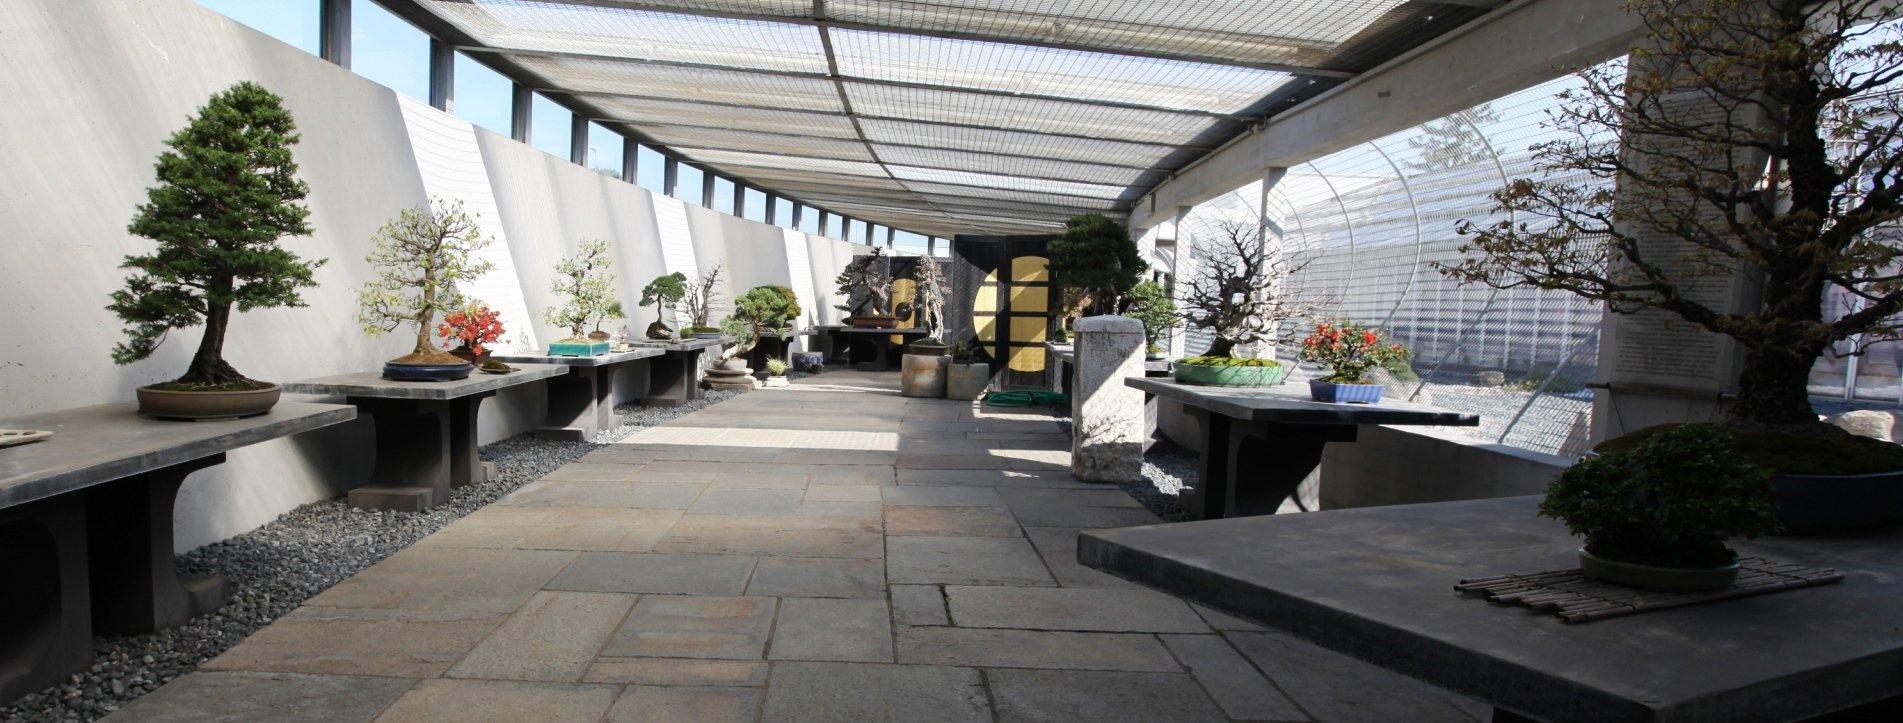 Museo Crespi Bonsai